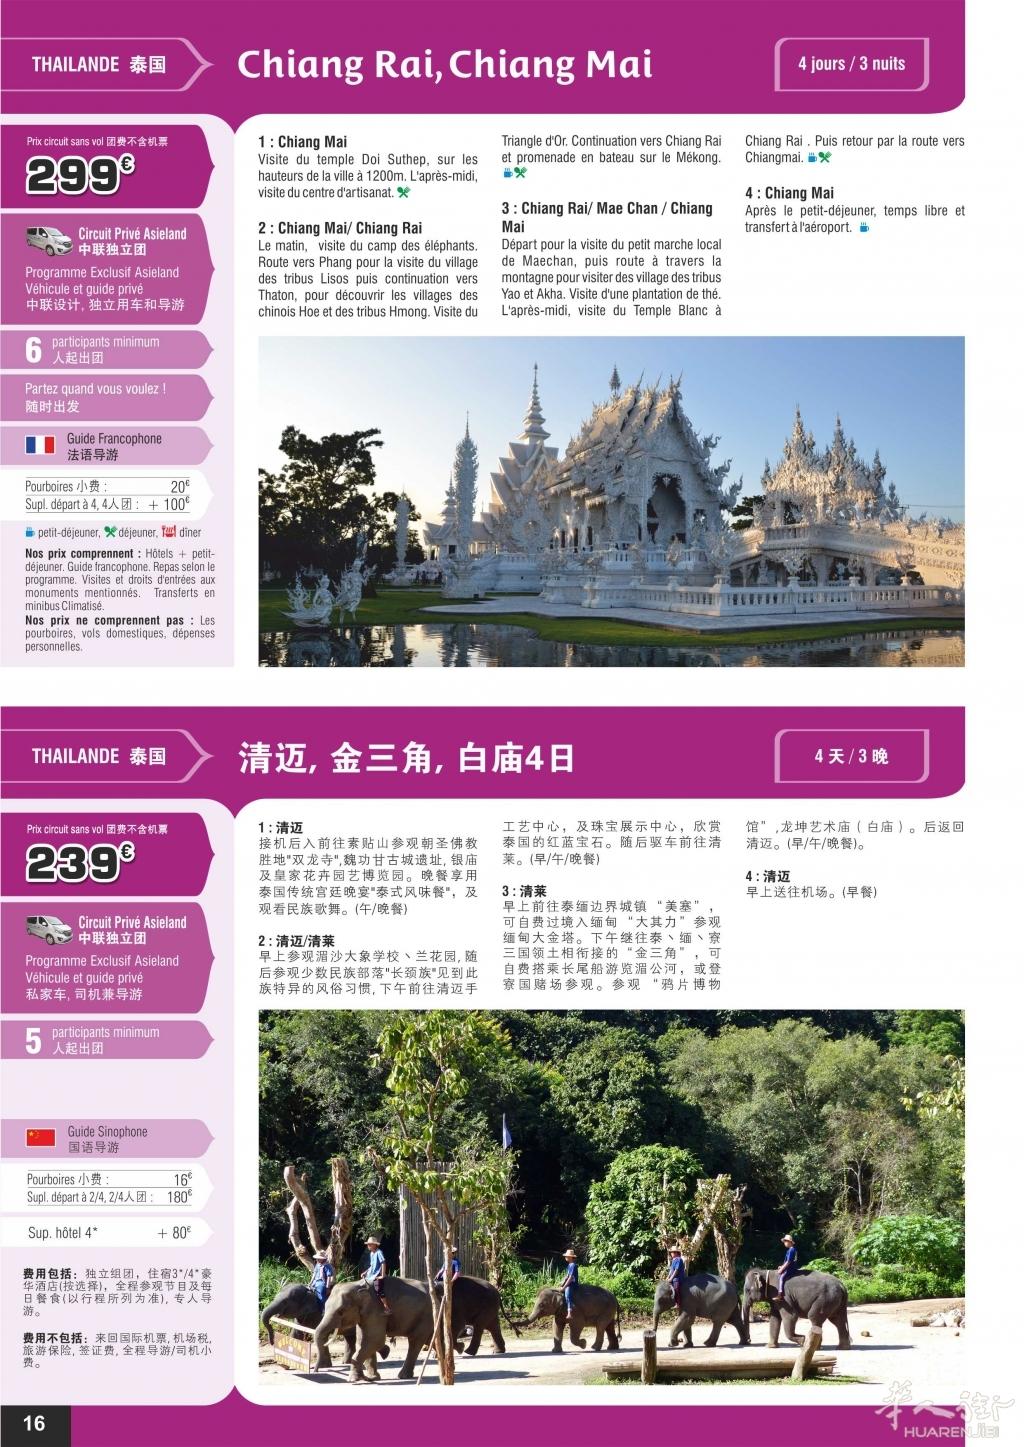 p16-Package-Chiang Rai 4j FR-CH-v06.jpg